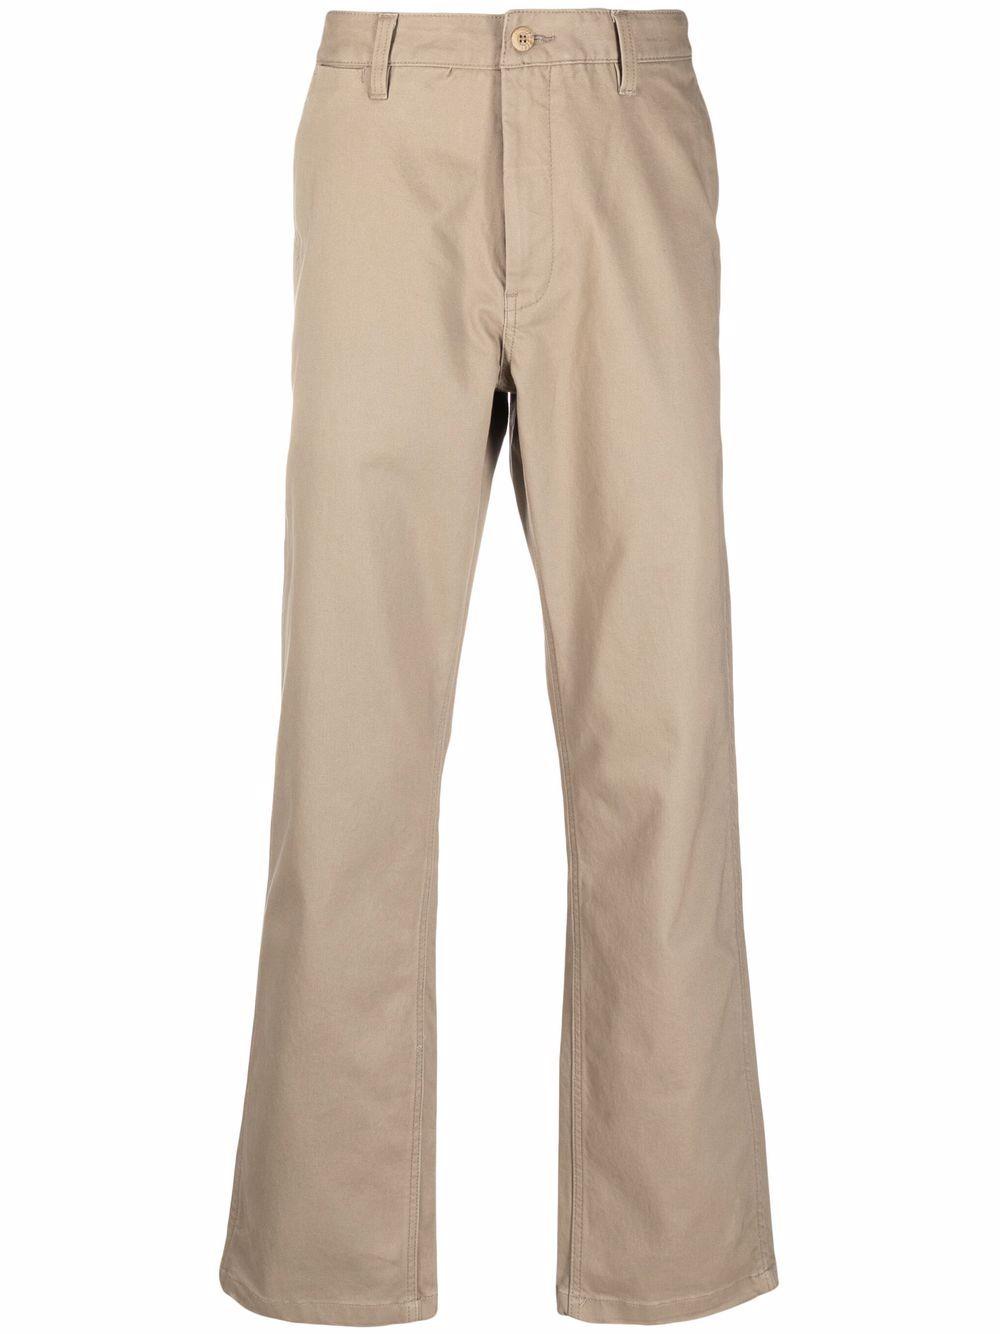 straight pants man beige in cotton VANS VAULT | Trousers | VN0A5E1PH3G1